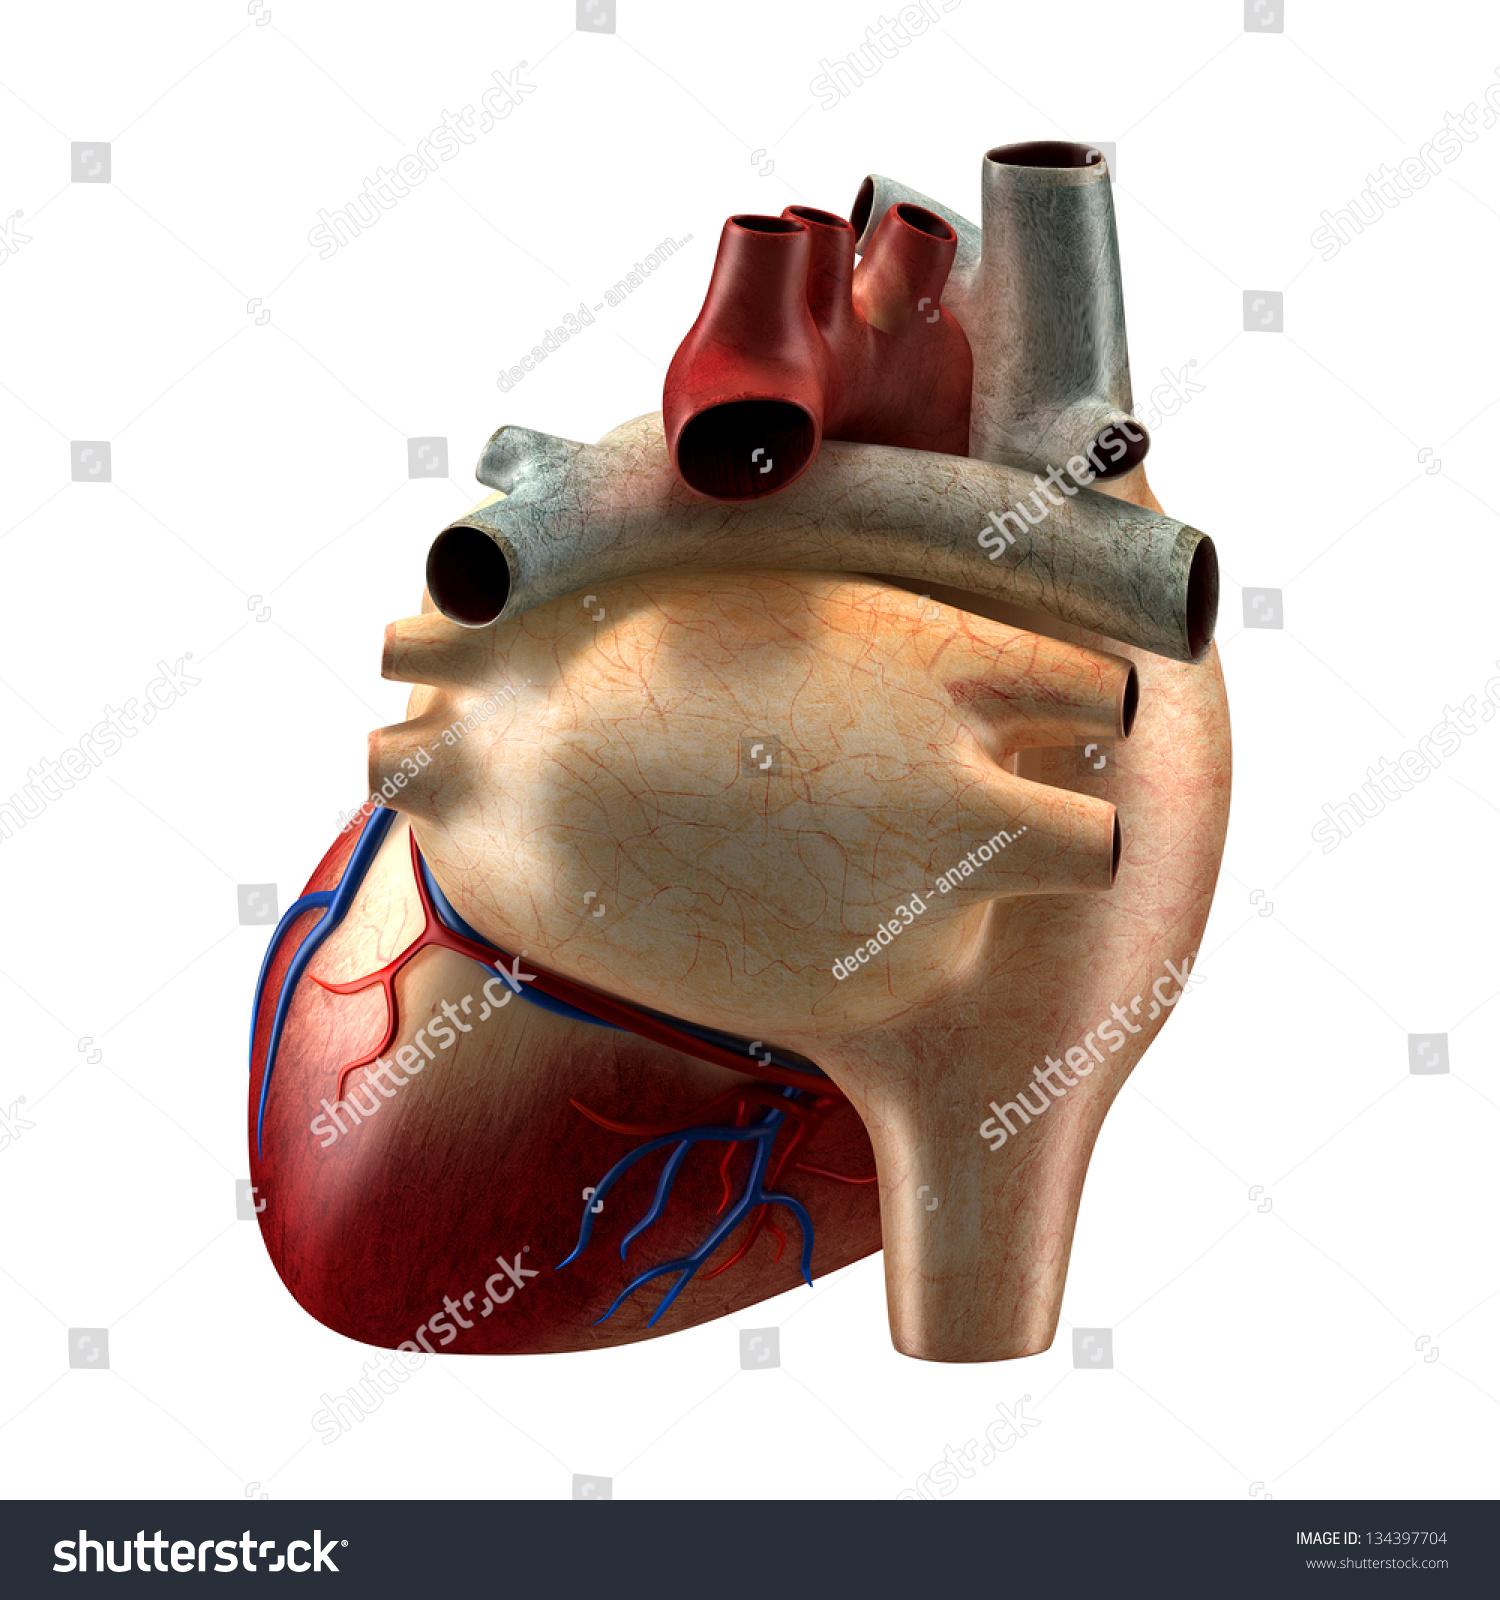 Anatomy Heart Back View Stockillustration 134397704 Shutterstock